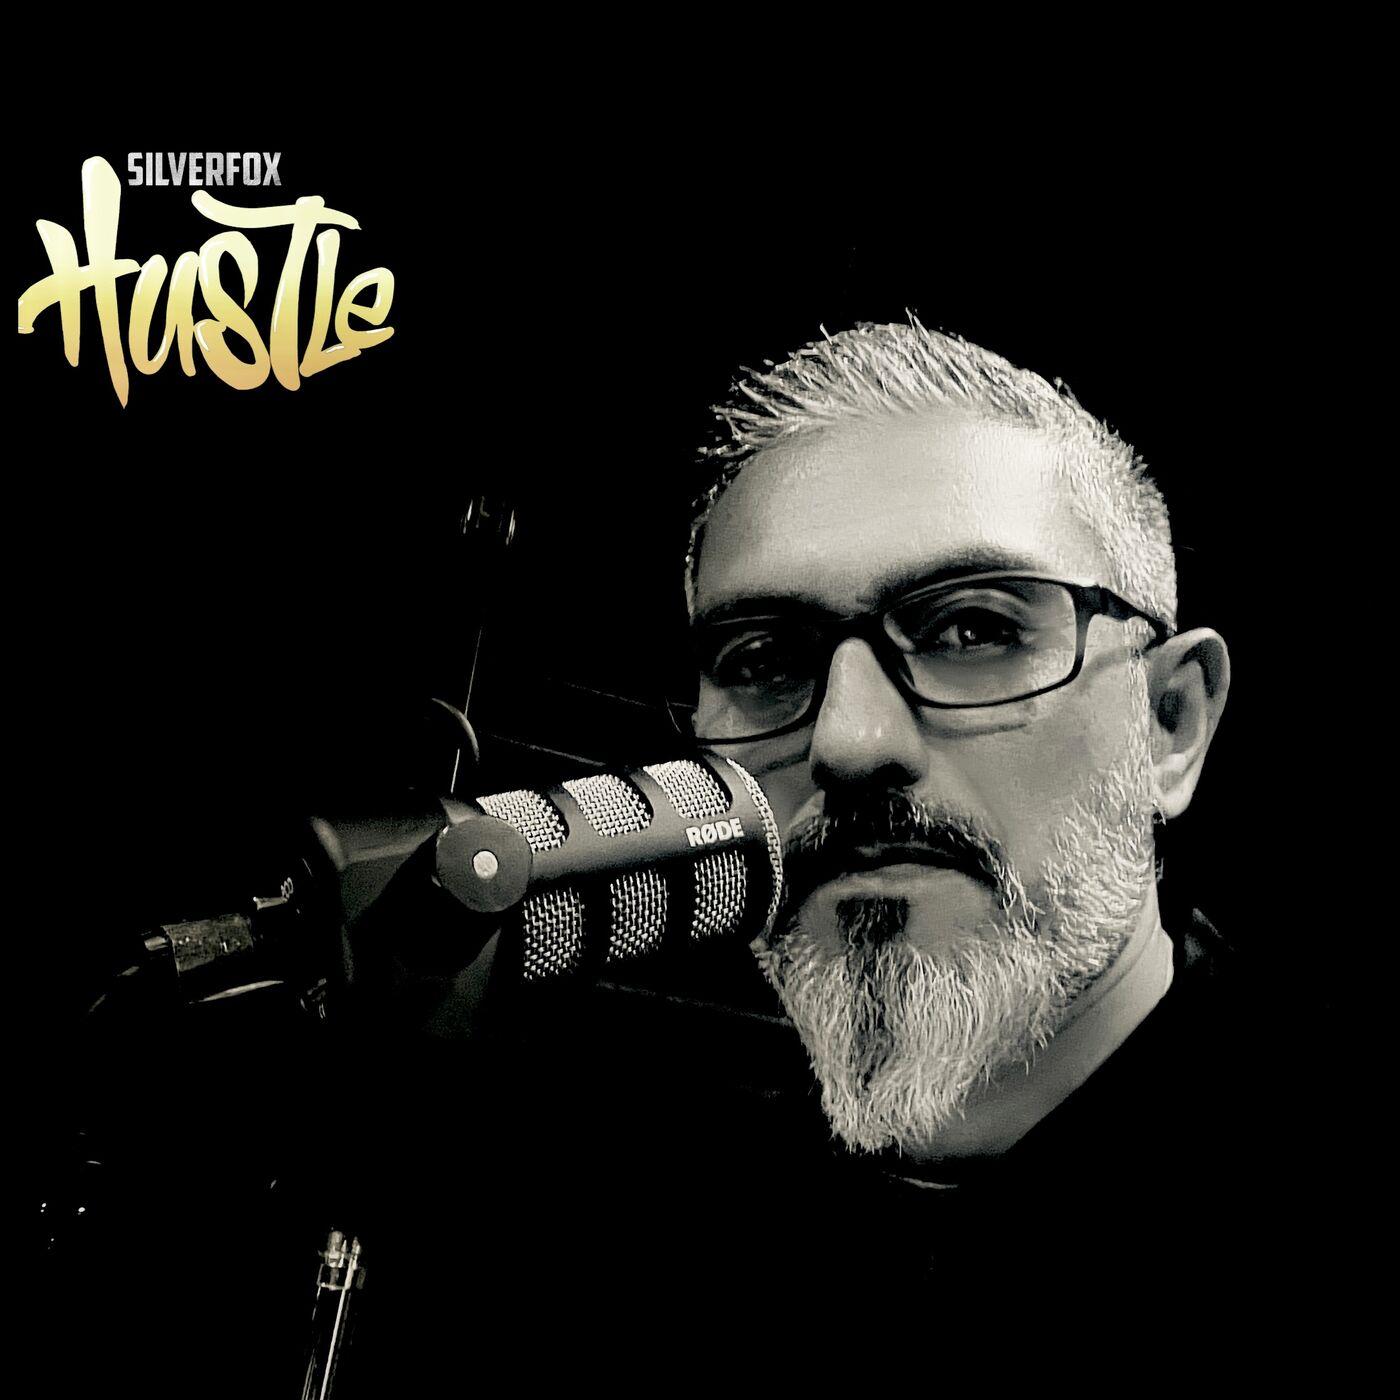 The Silverfox Hustle Podcast